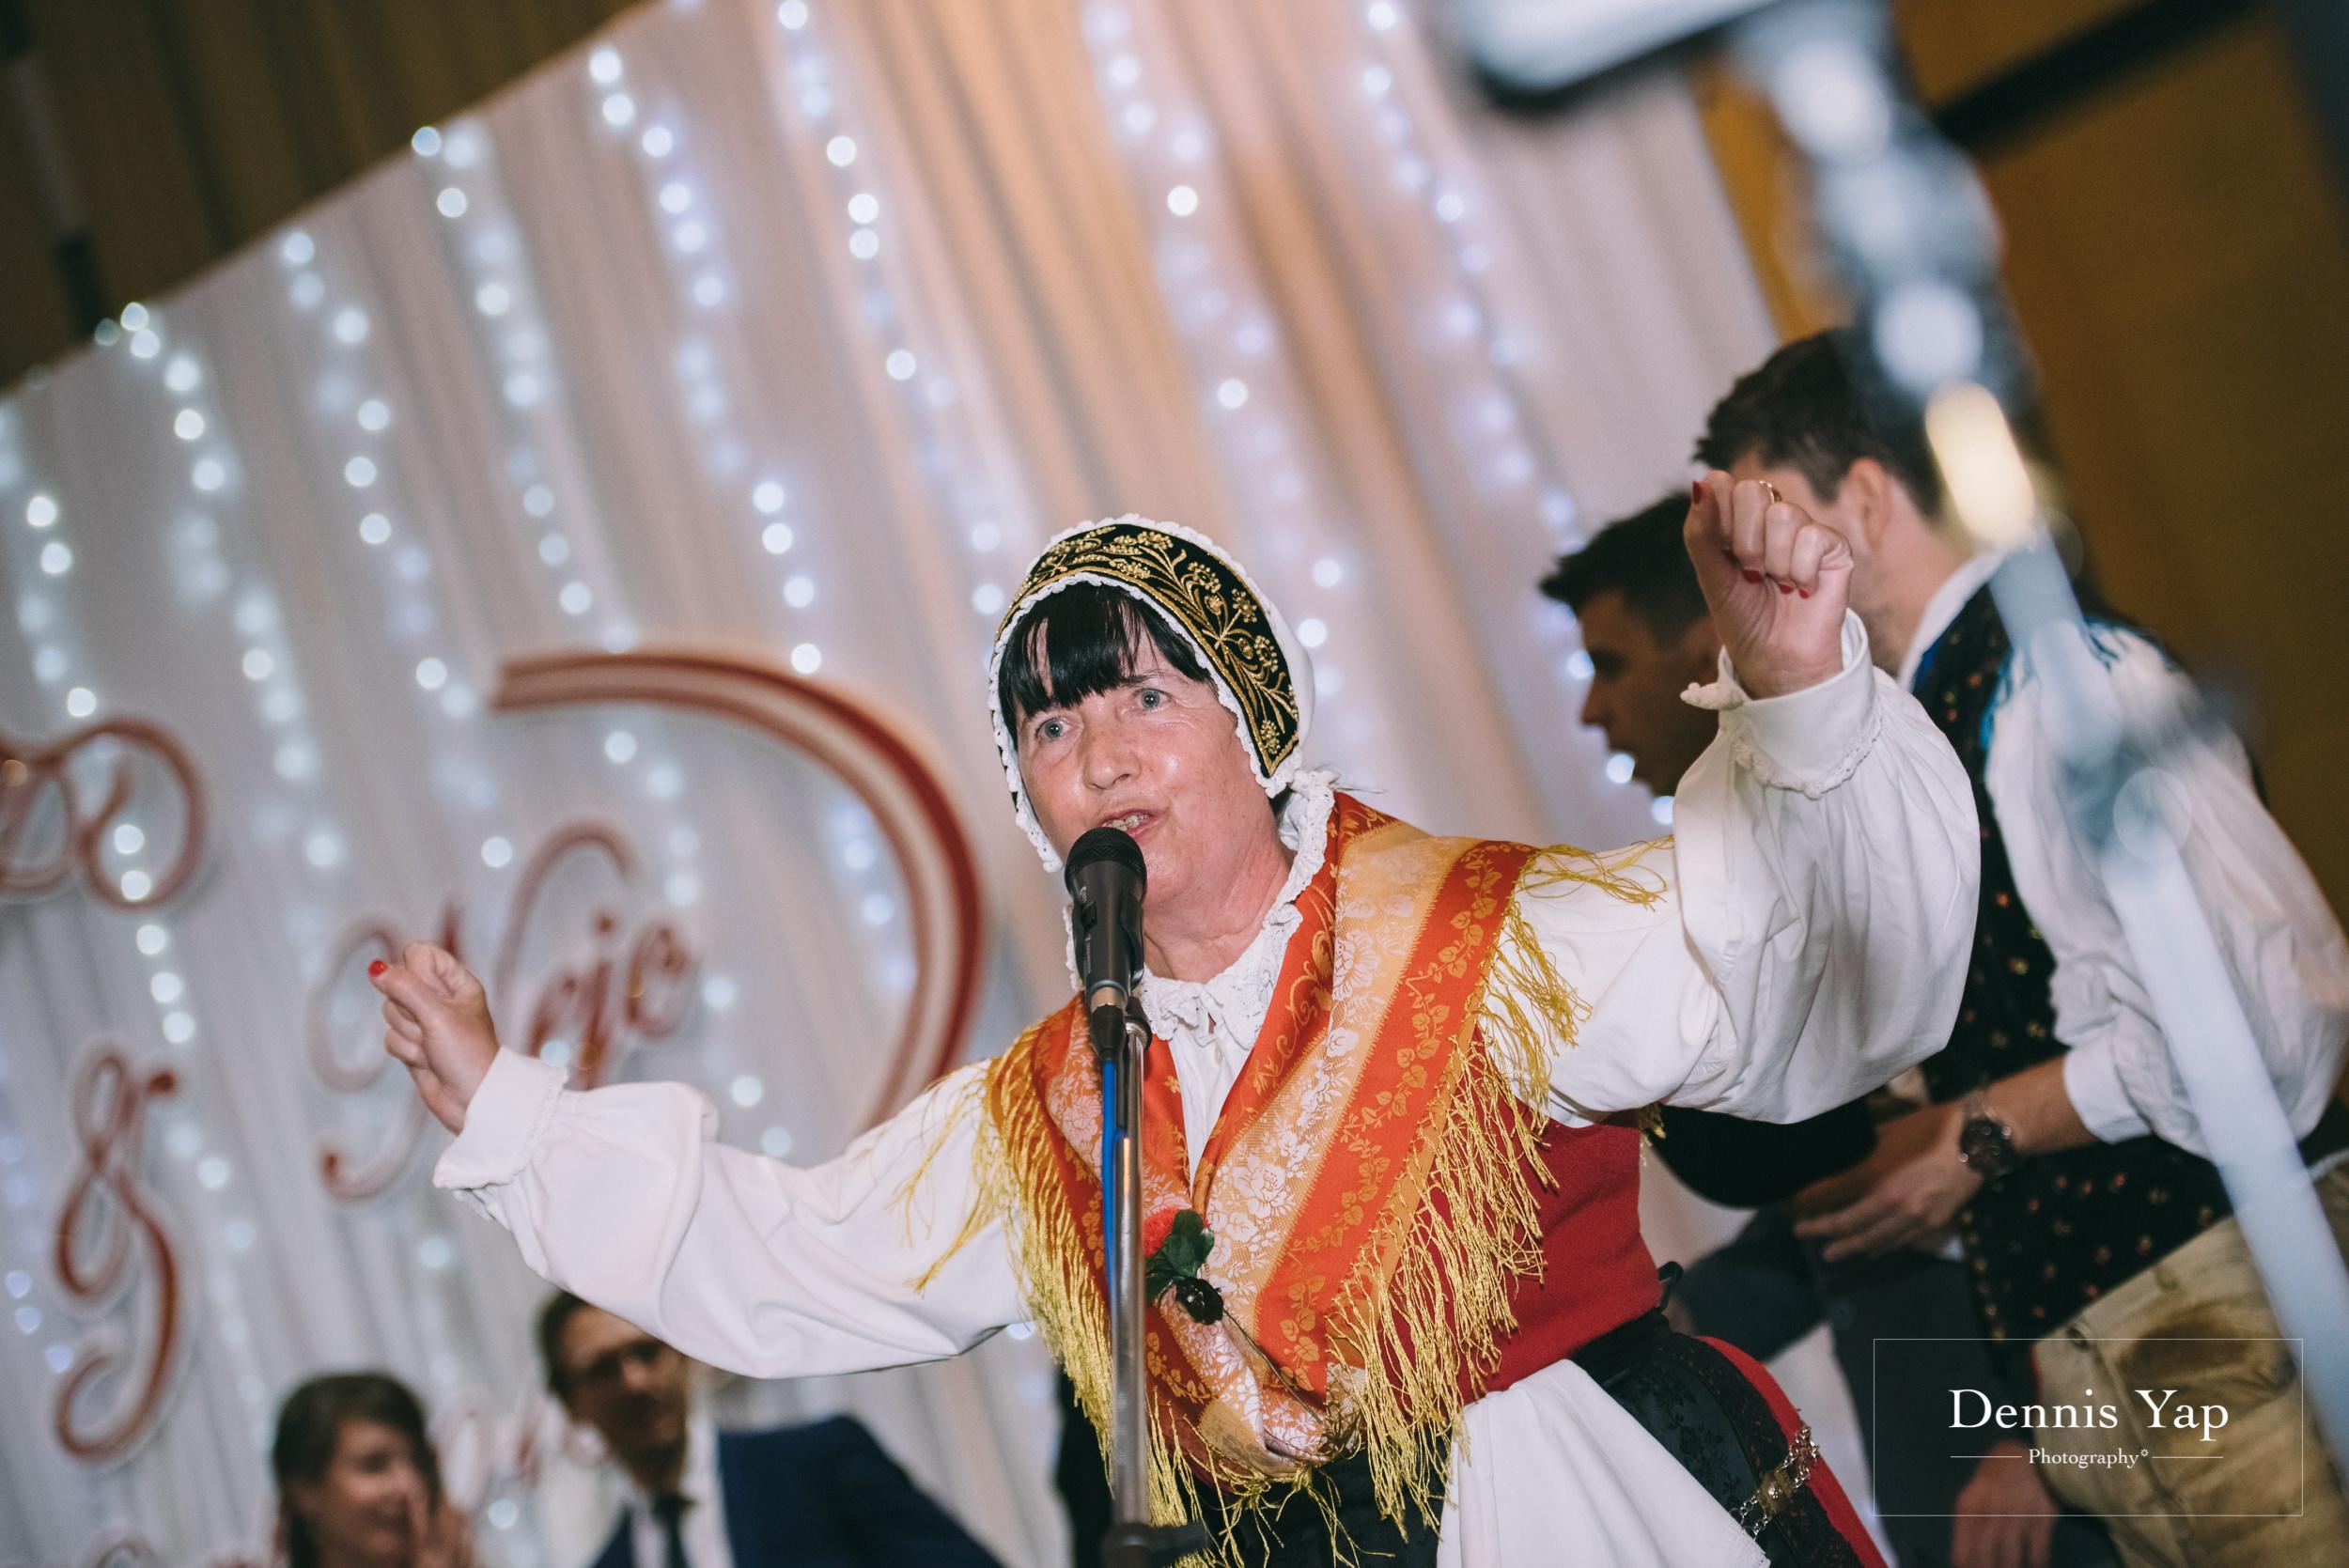 nejd leena slovenian wedding reception malaysia wedding photographer dennis yap premier hotel klang-11.jpg